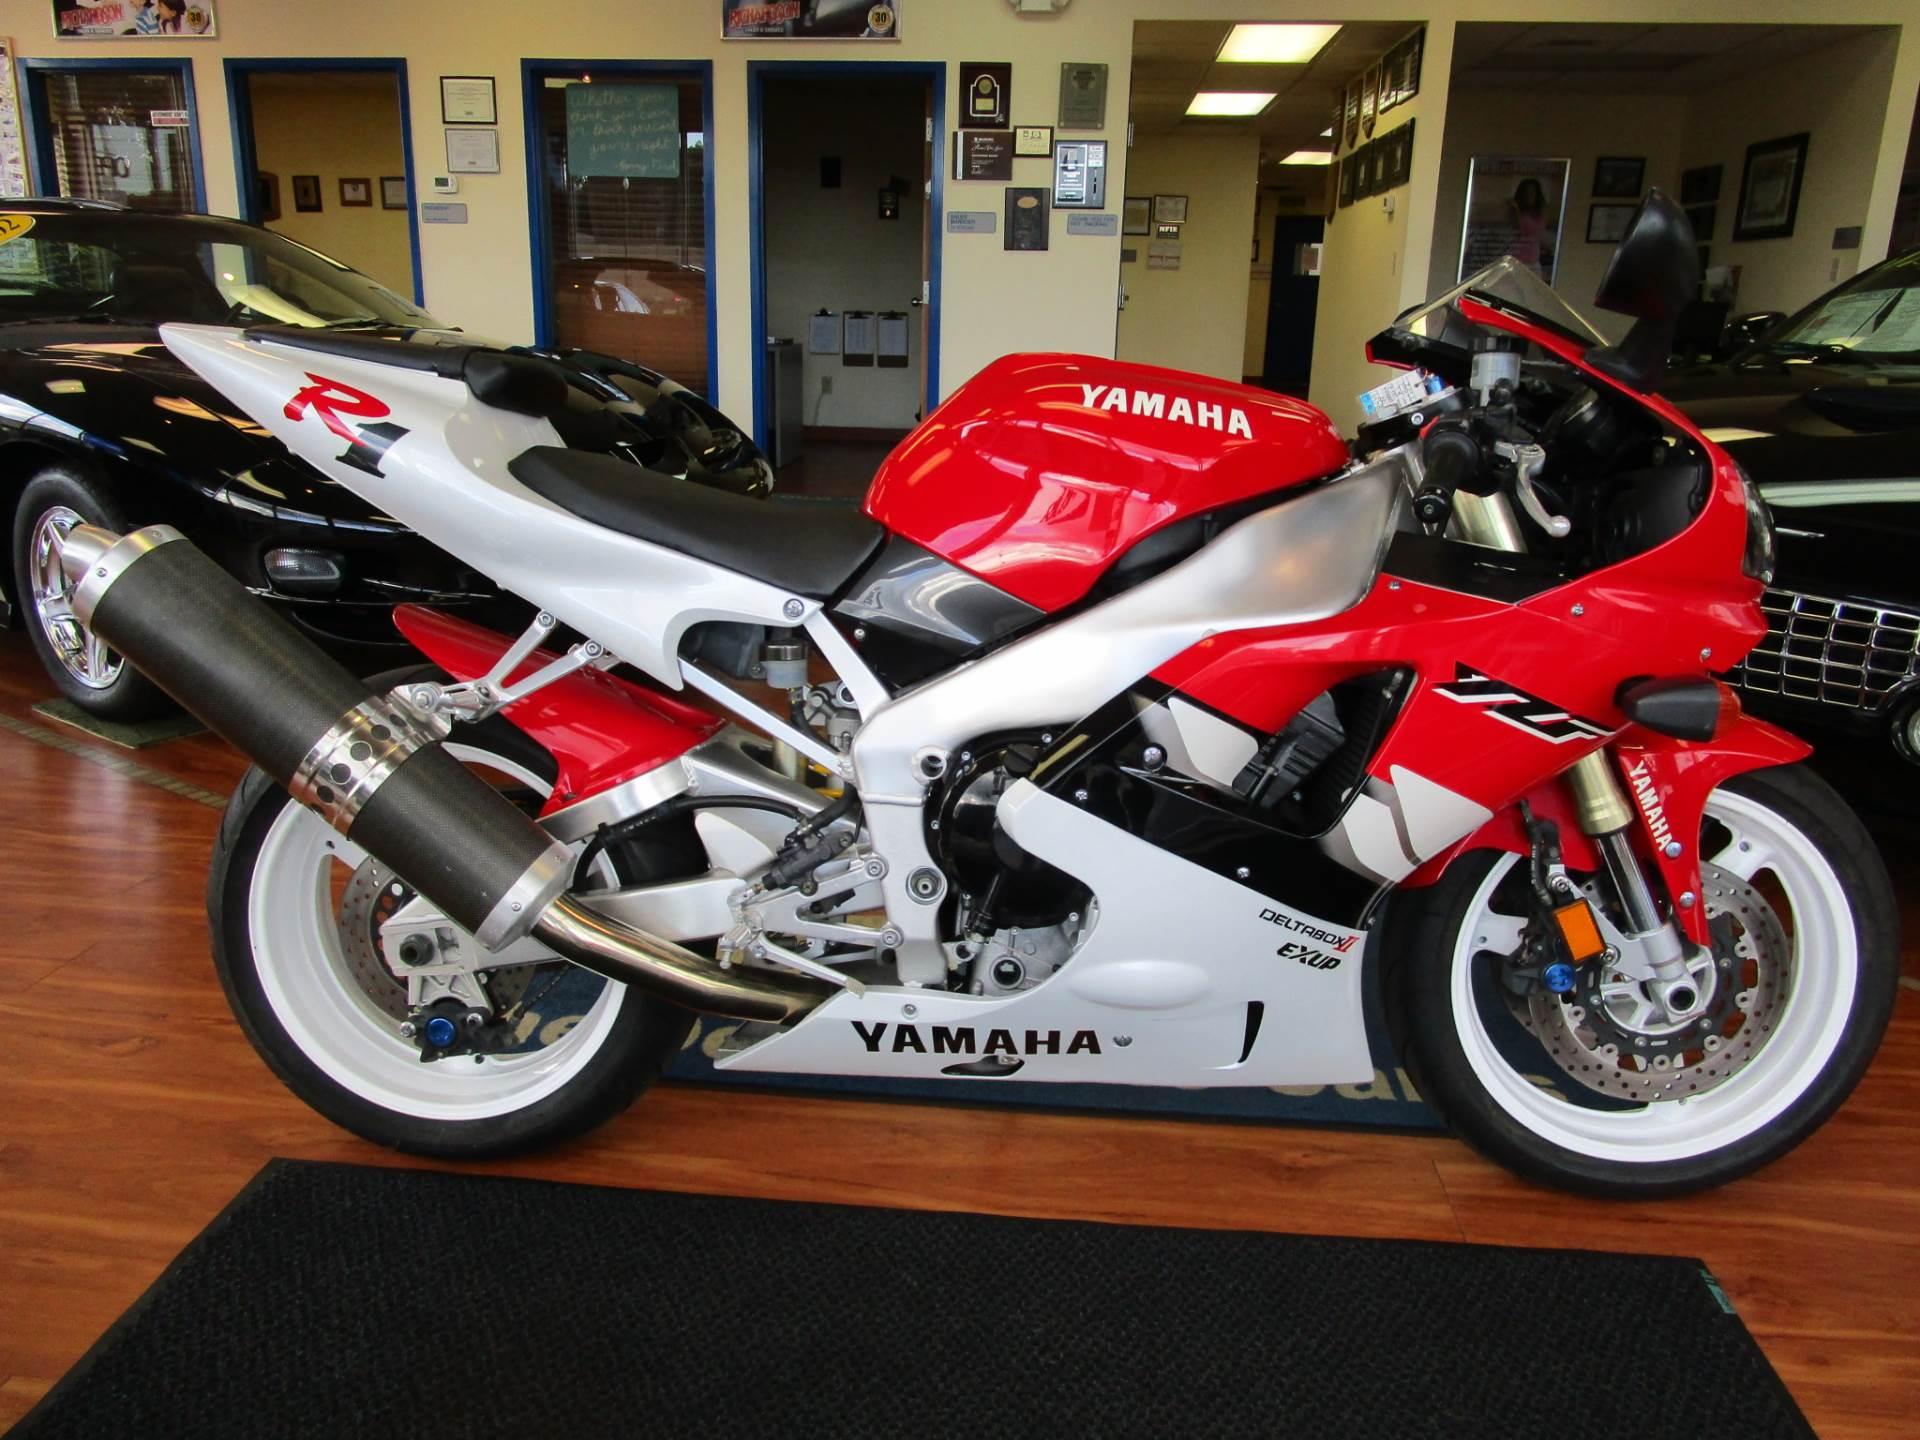 2001 Yamaha R1 for sale 106151